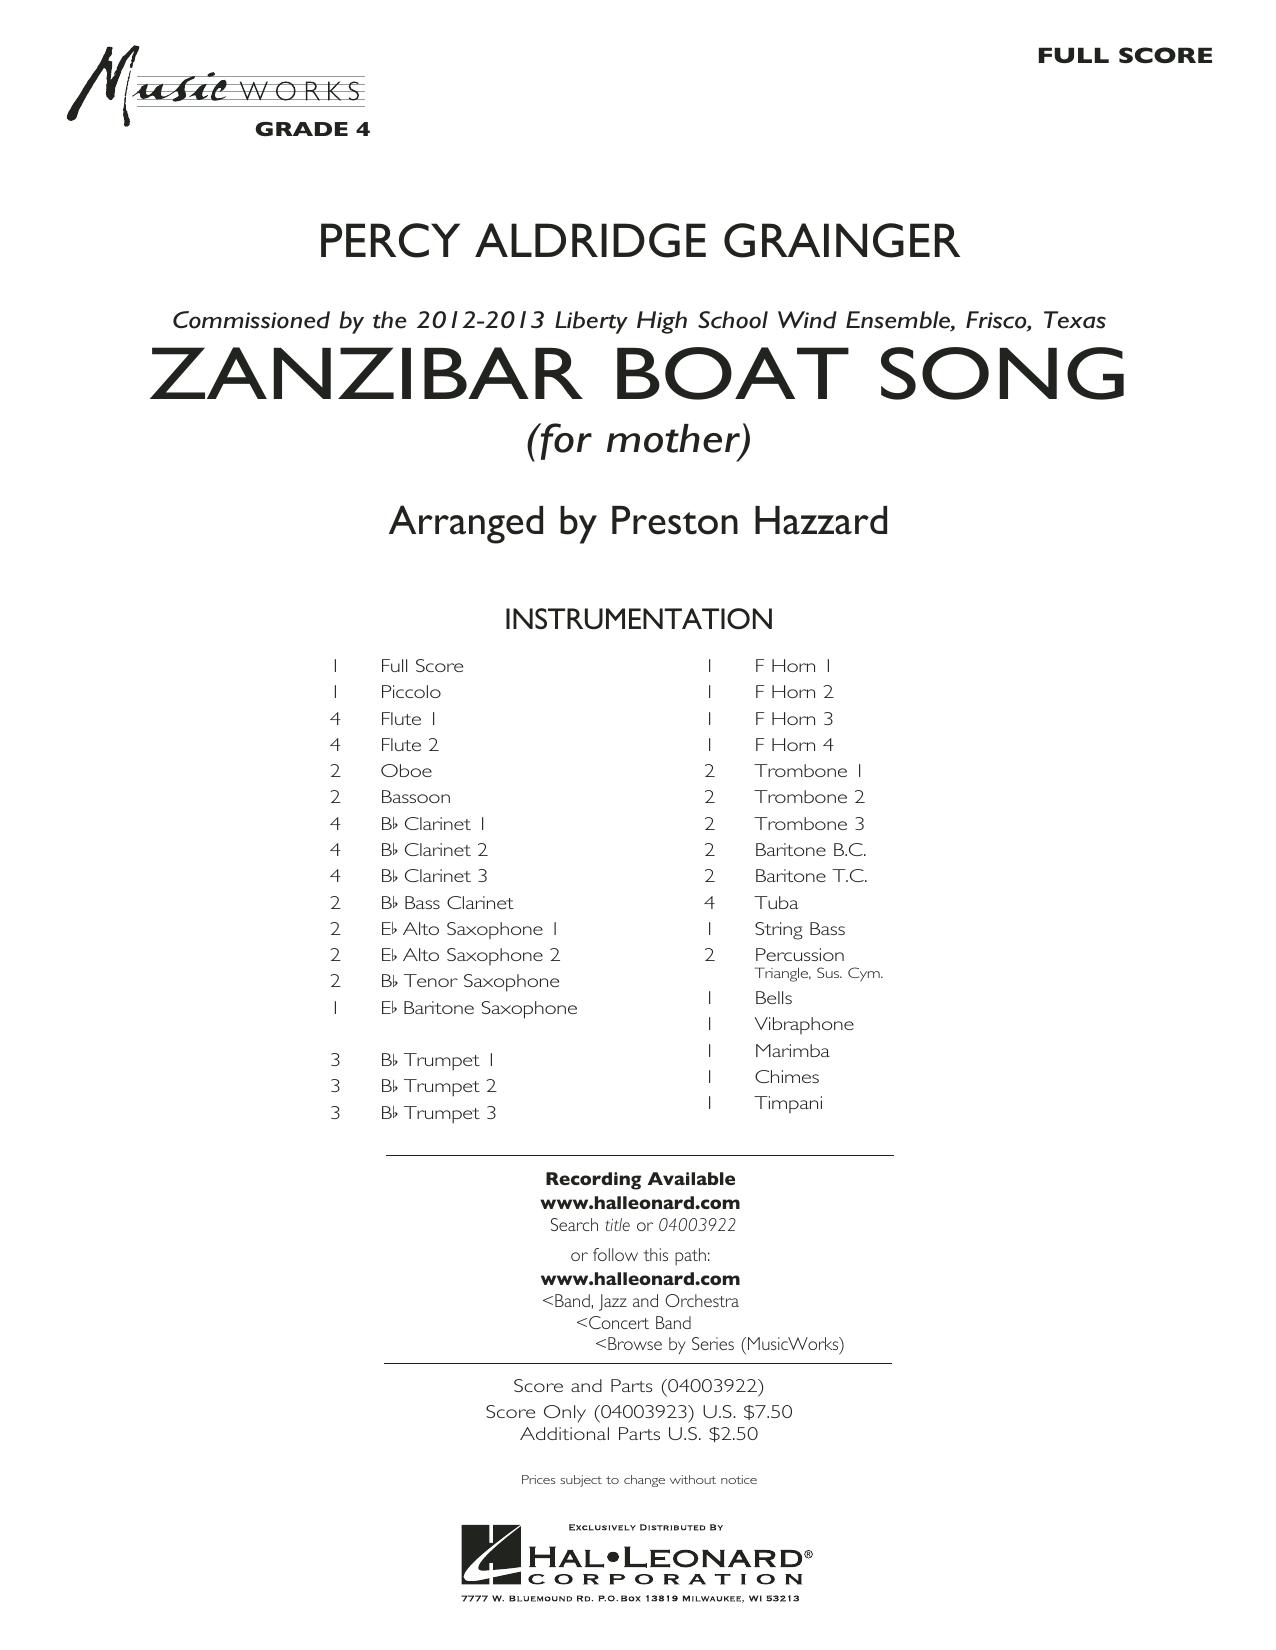 Zanzibar Boat Song (COMPLETE) sheet music for concert band by Preston Hazzard